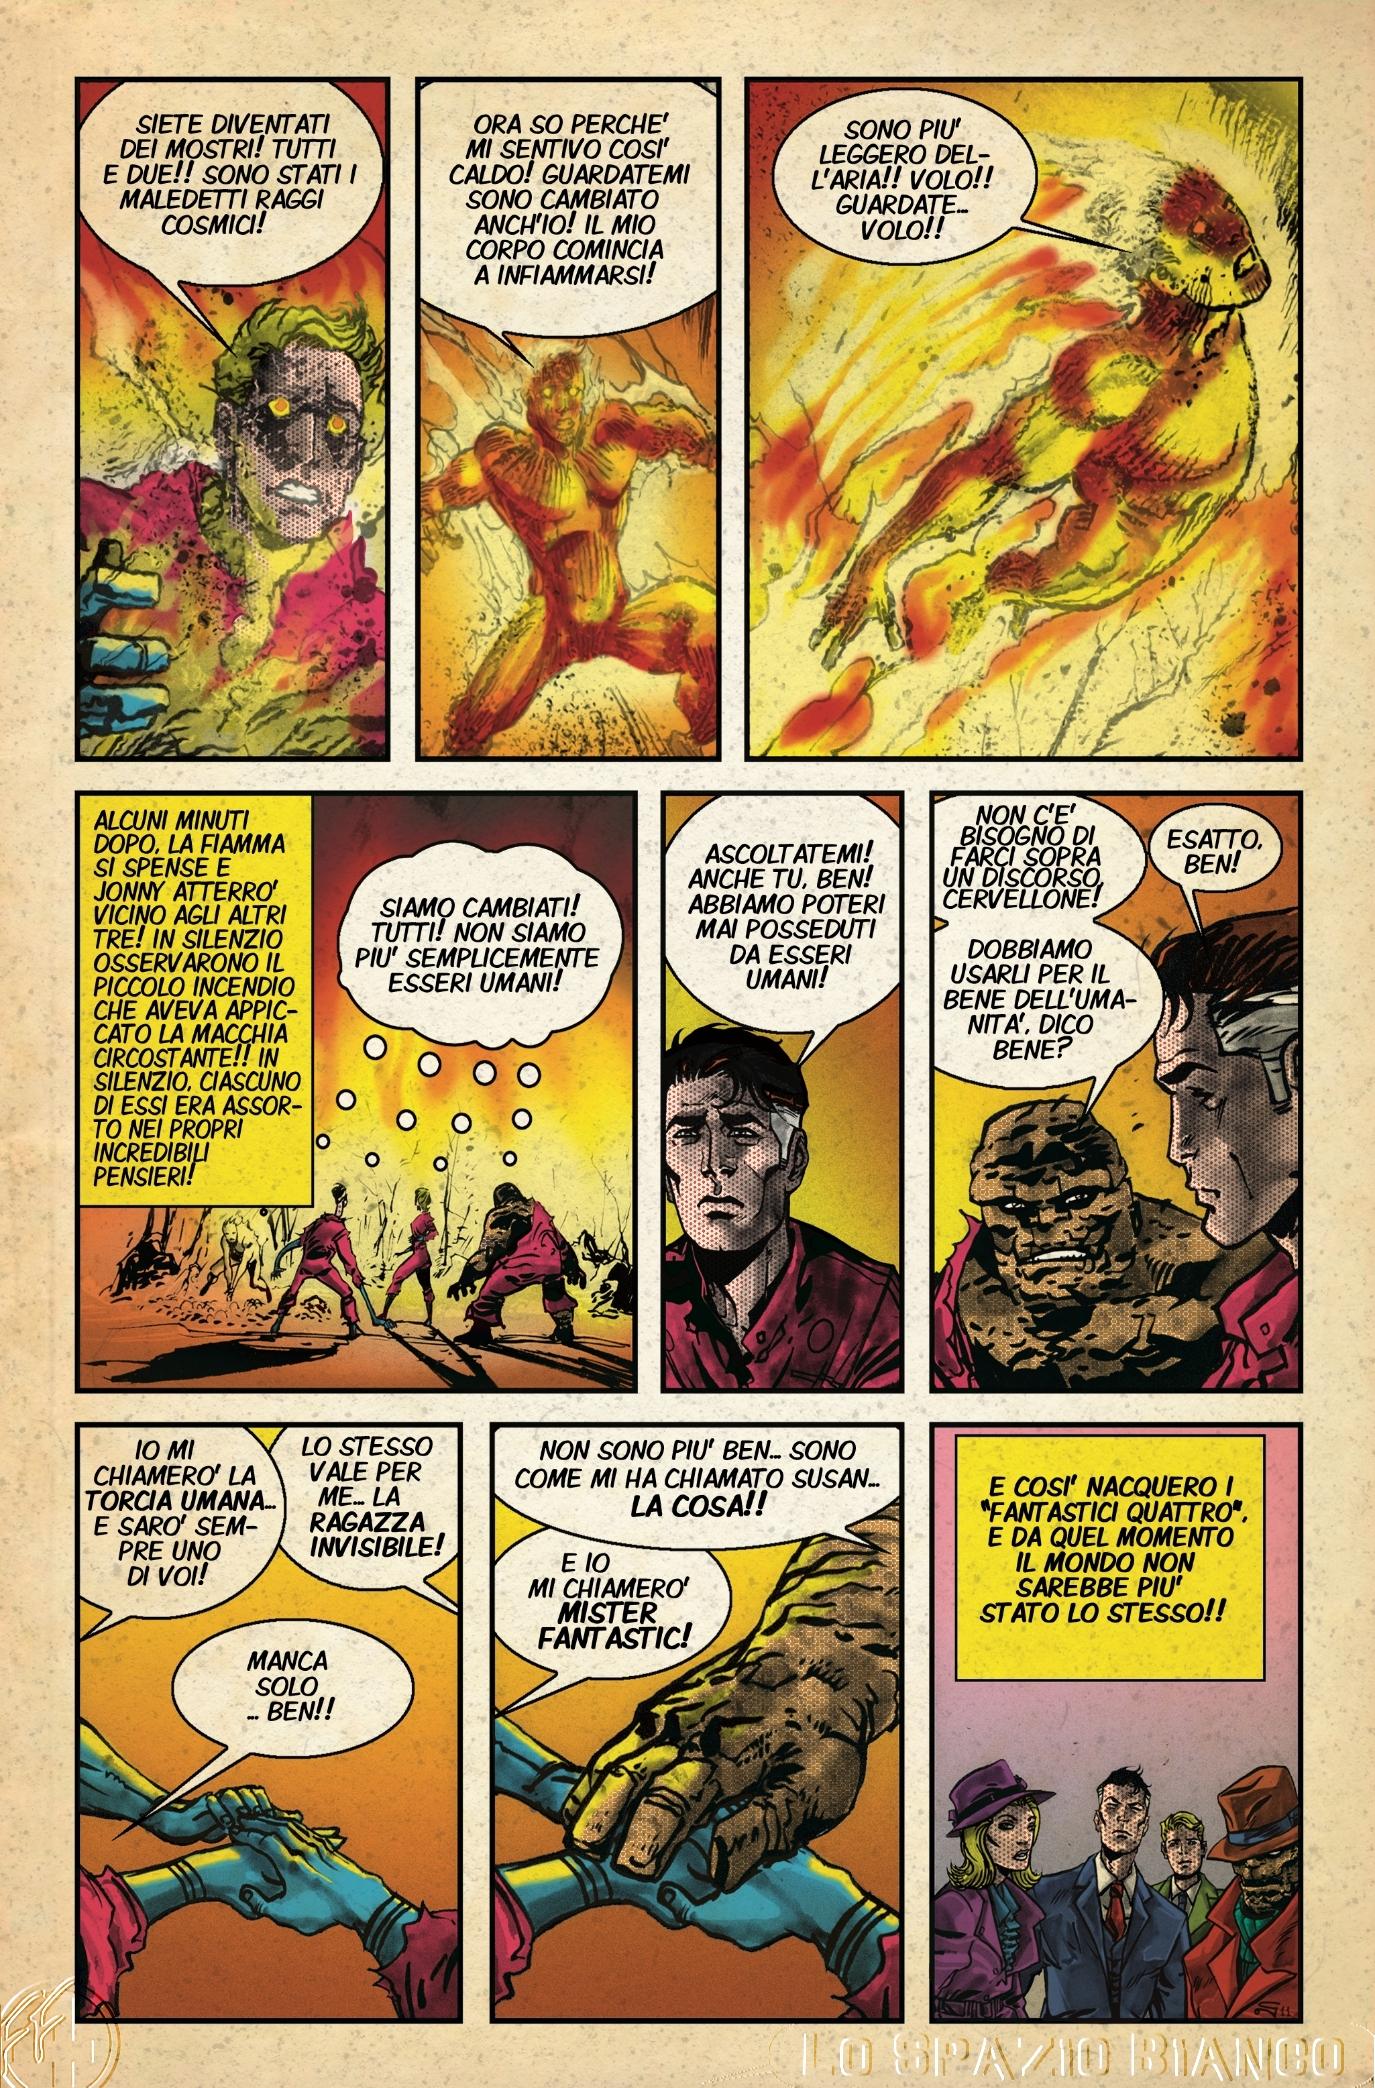 Fantastici Quattro n.1 Tavola 13 (Carmine di Giandomenico)